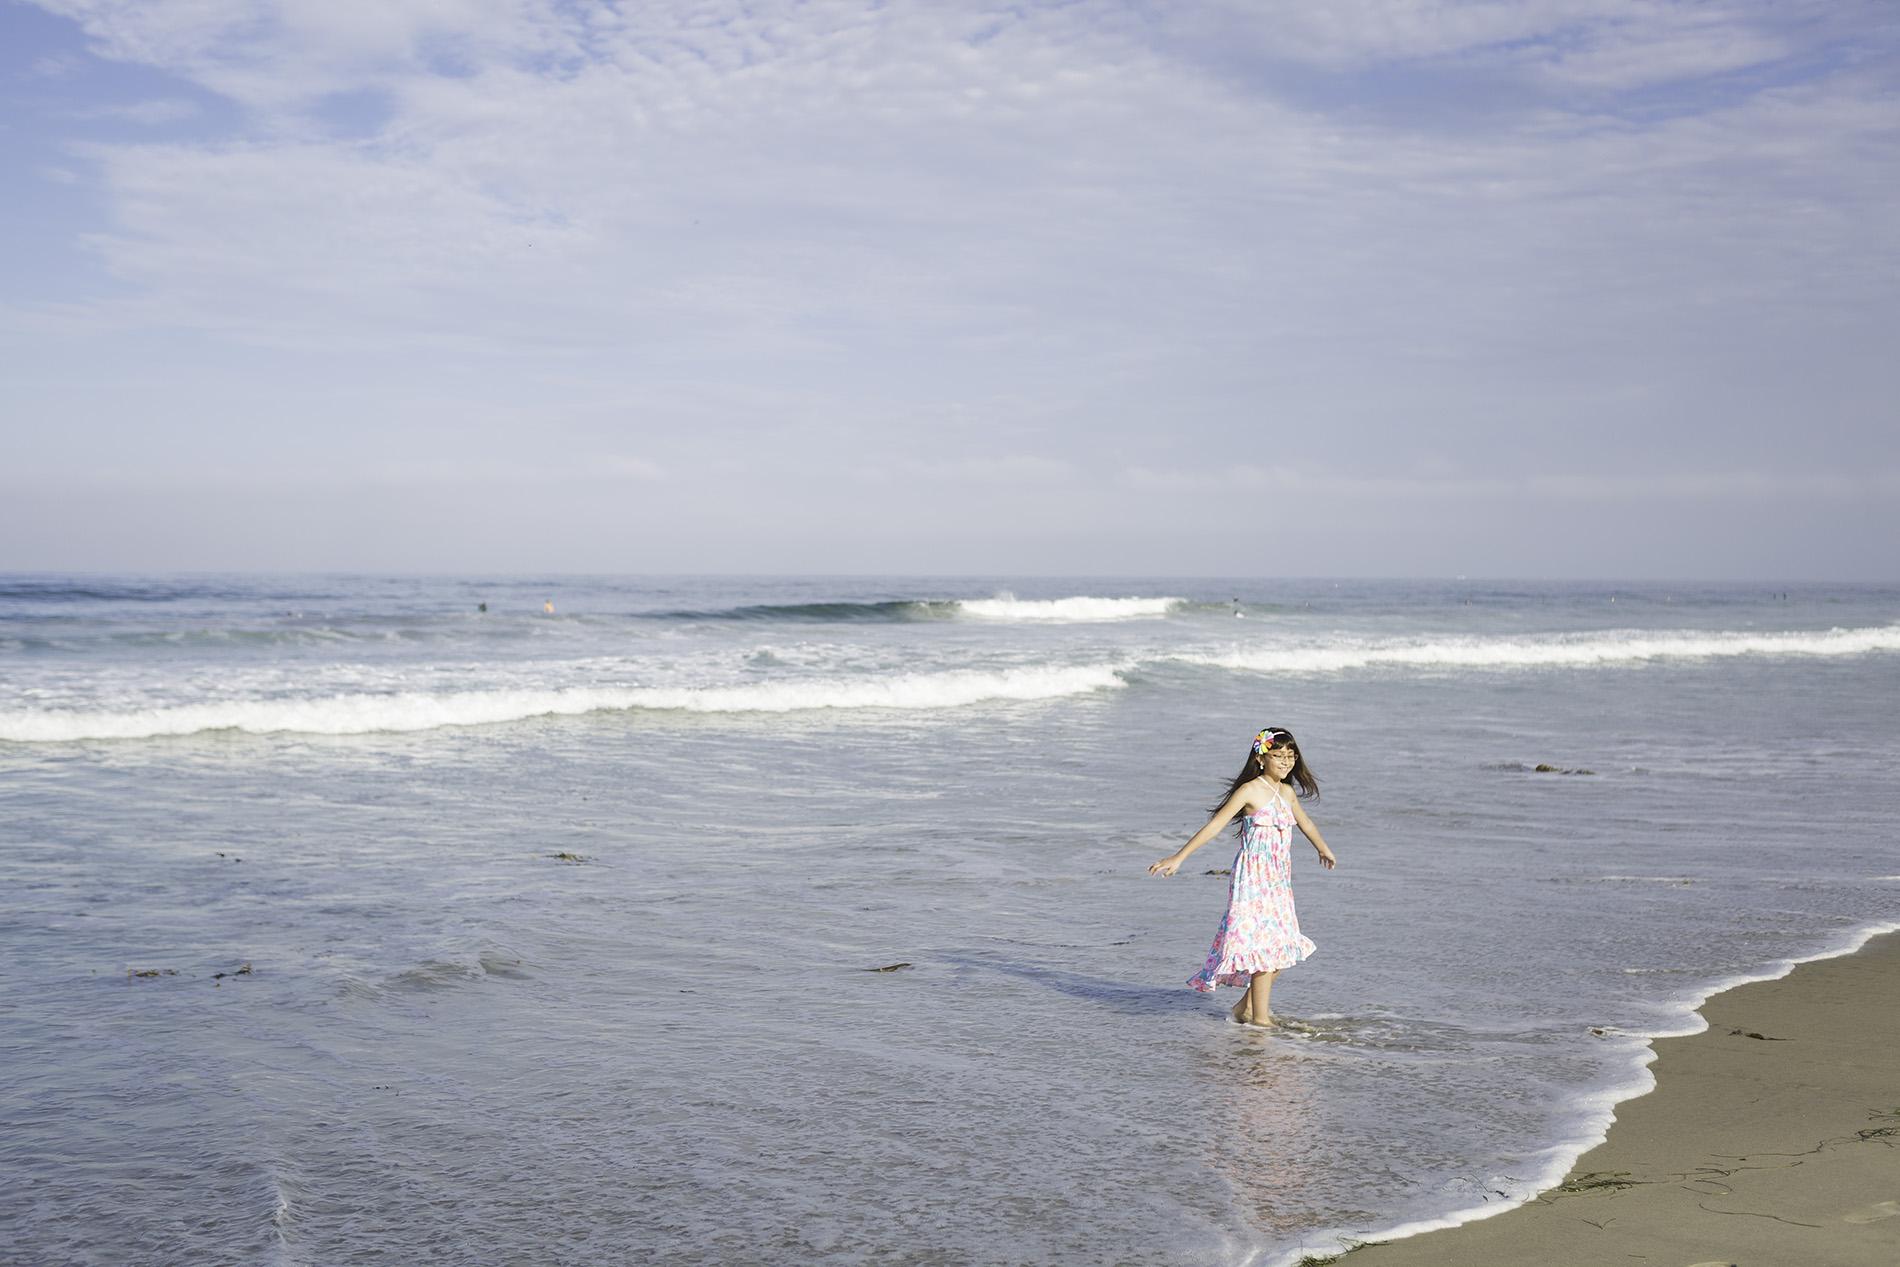 San.Diego.Vacation.Photographer.Christine.Dammann.Photographer.Beach.WS.GF.jpg